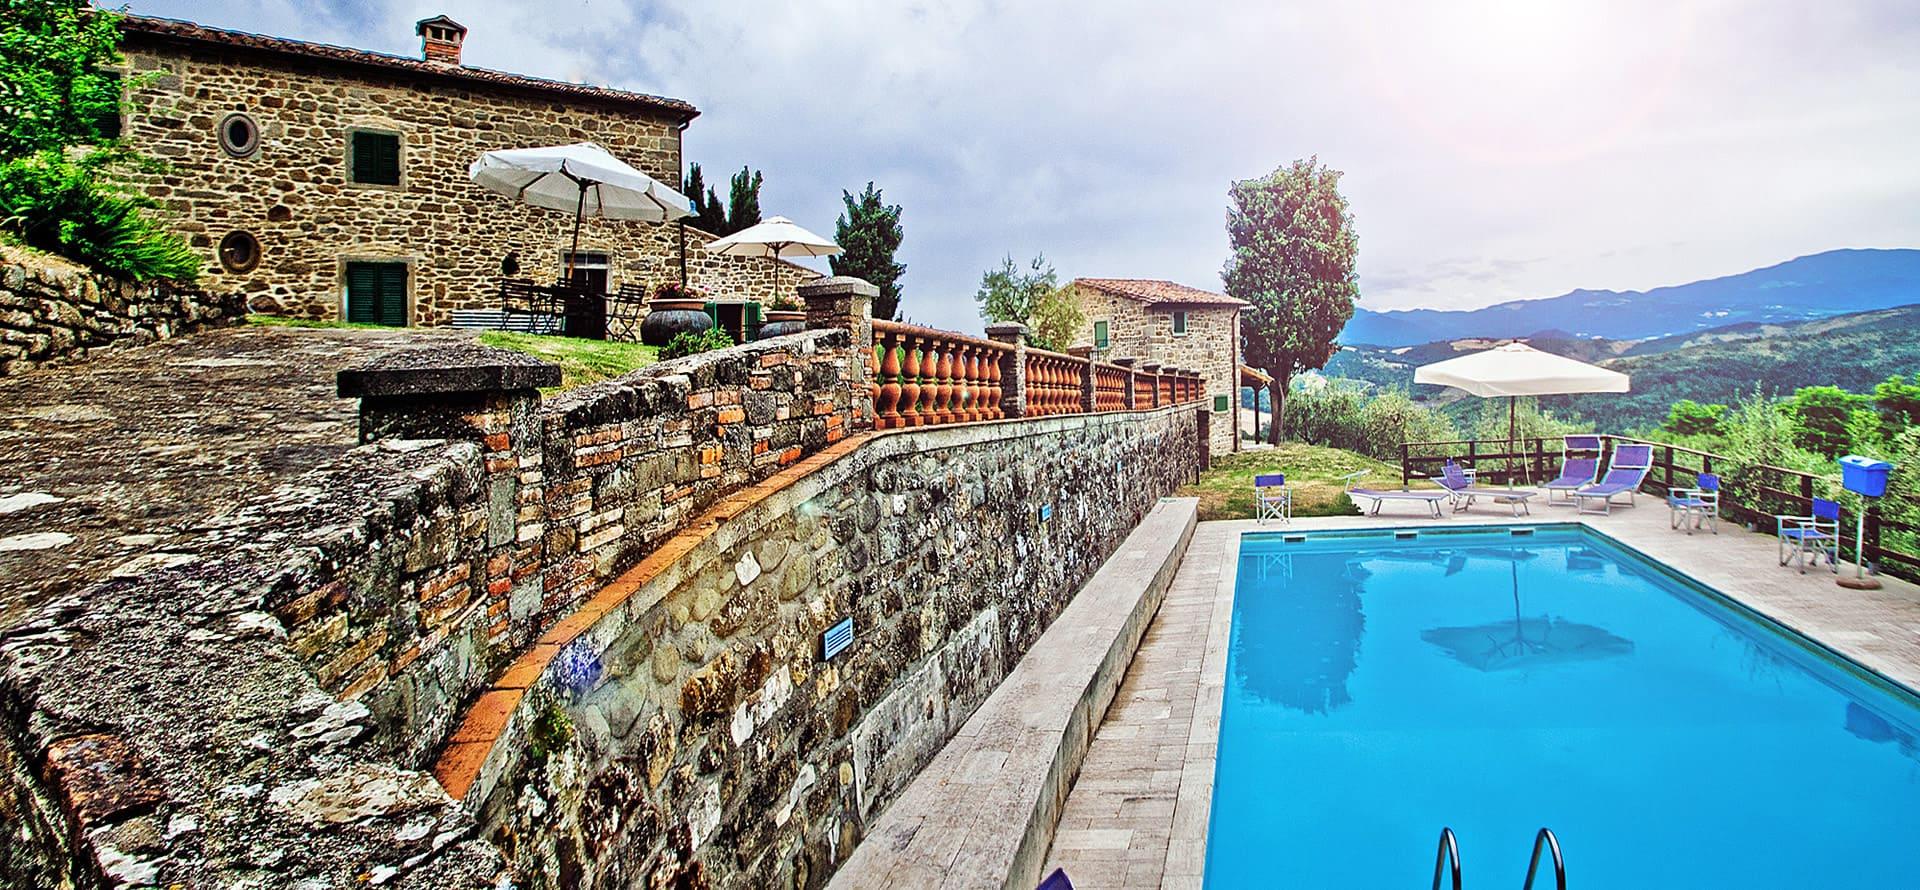 Servizi agriturismo Toscana